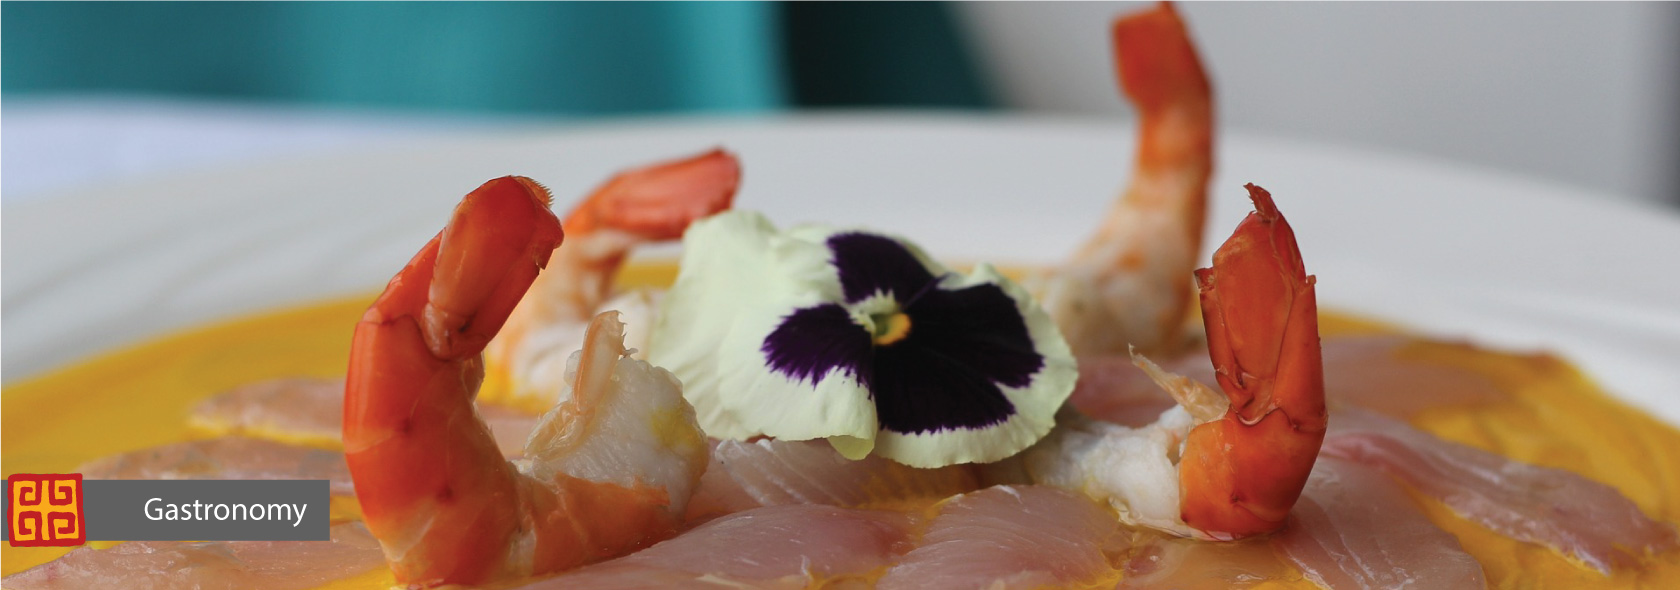 Peru Gastronomy